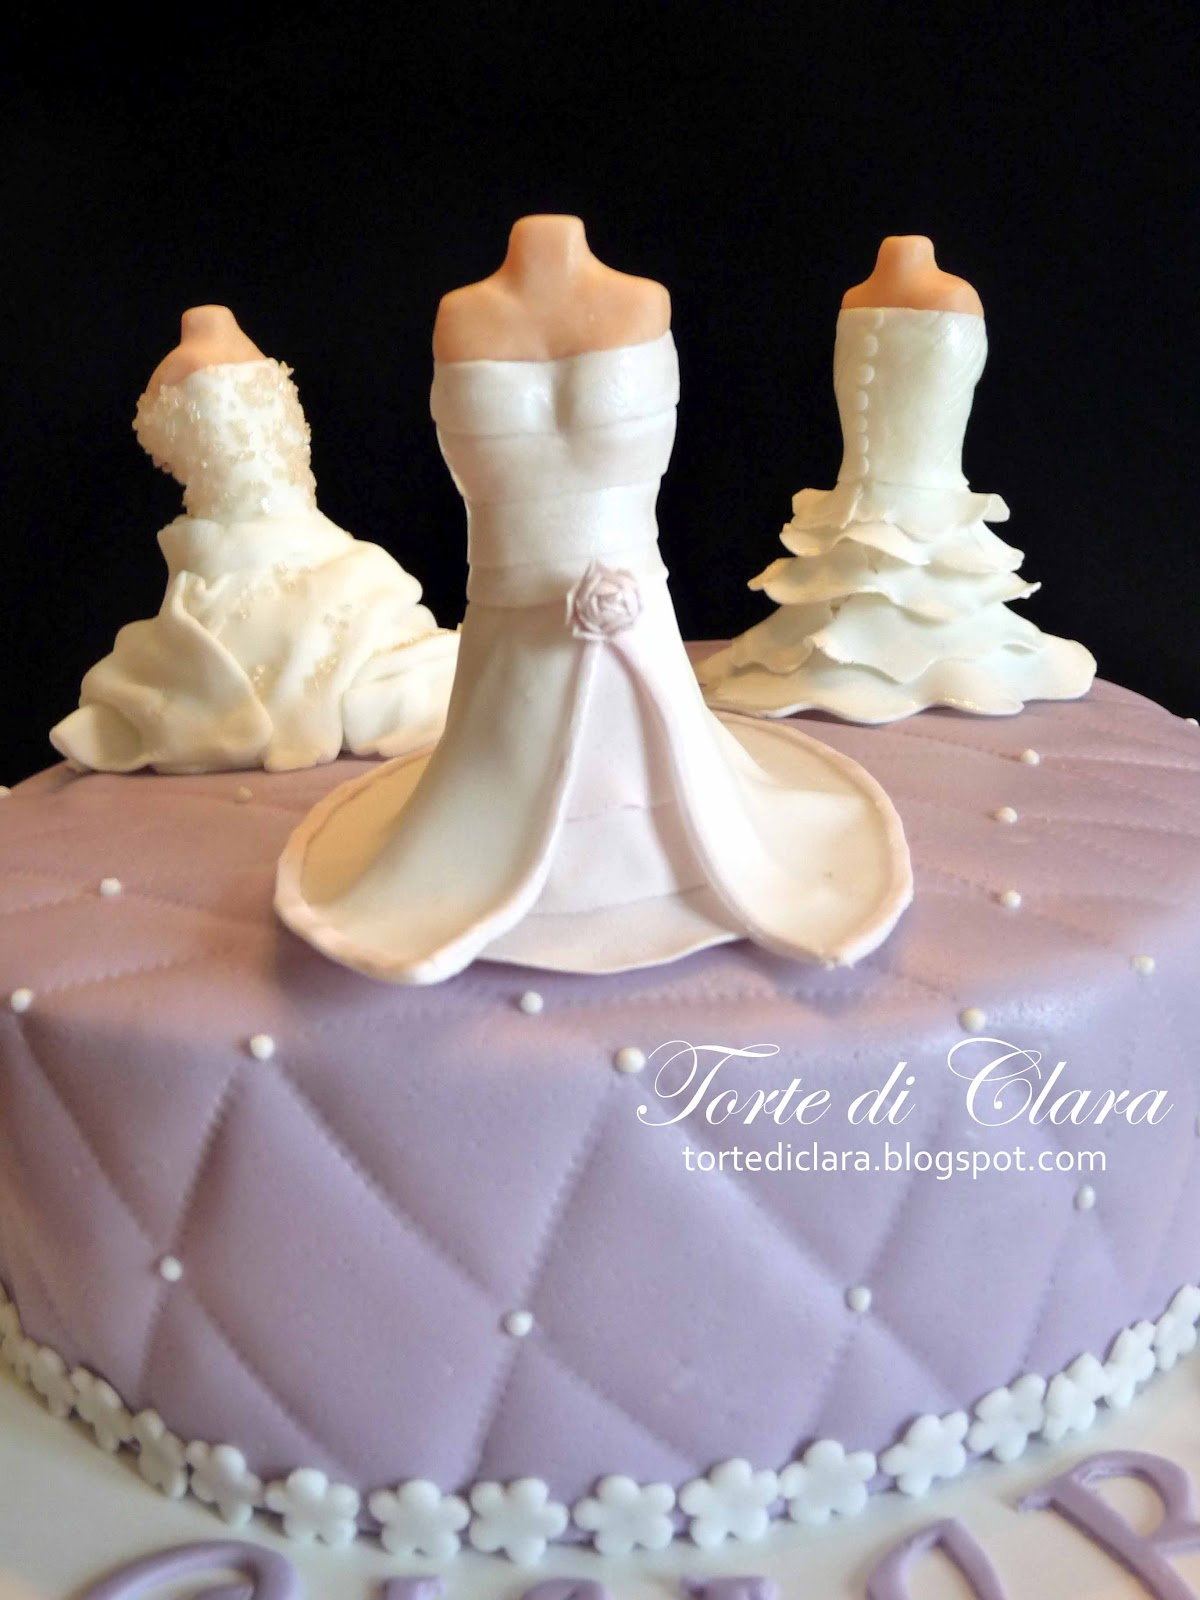 http://2.bp.blogspot.com/-Y6jWHOrpi_M/T7xrvaWK_vI/AAAAAAAAAwY/EzqAZYKOE3I/s1600/wedding_dress_cake_2.jpg